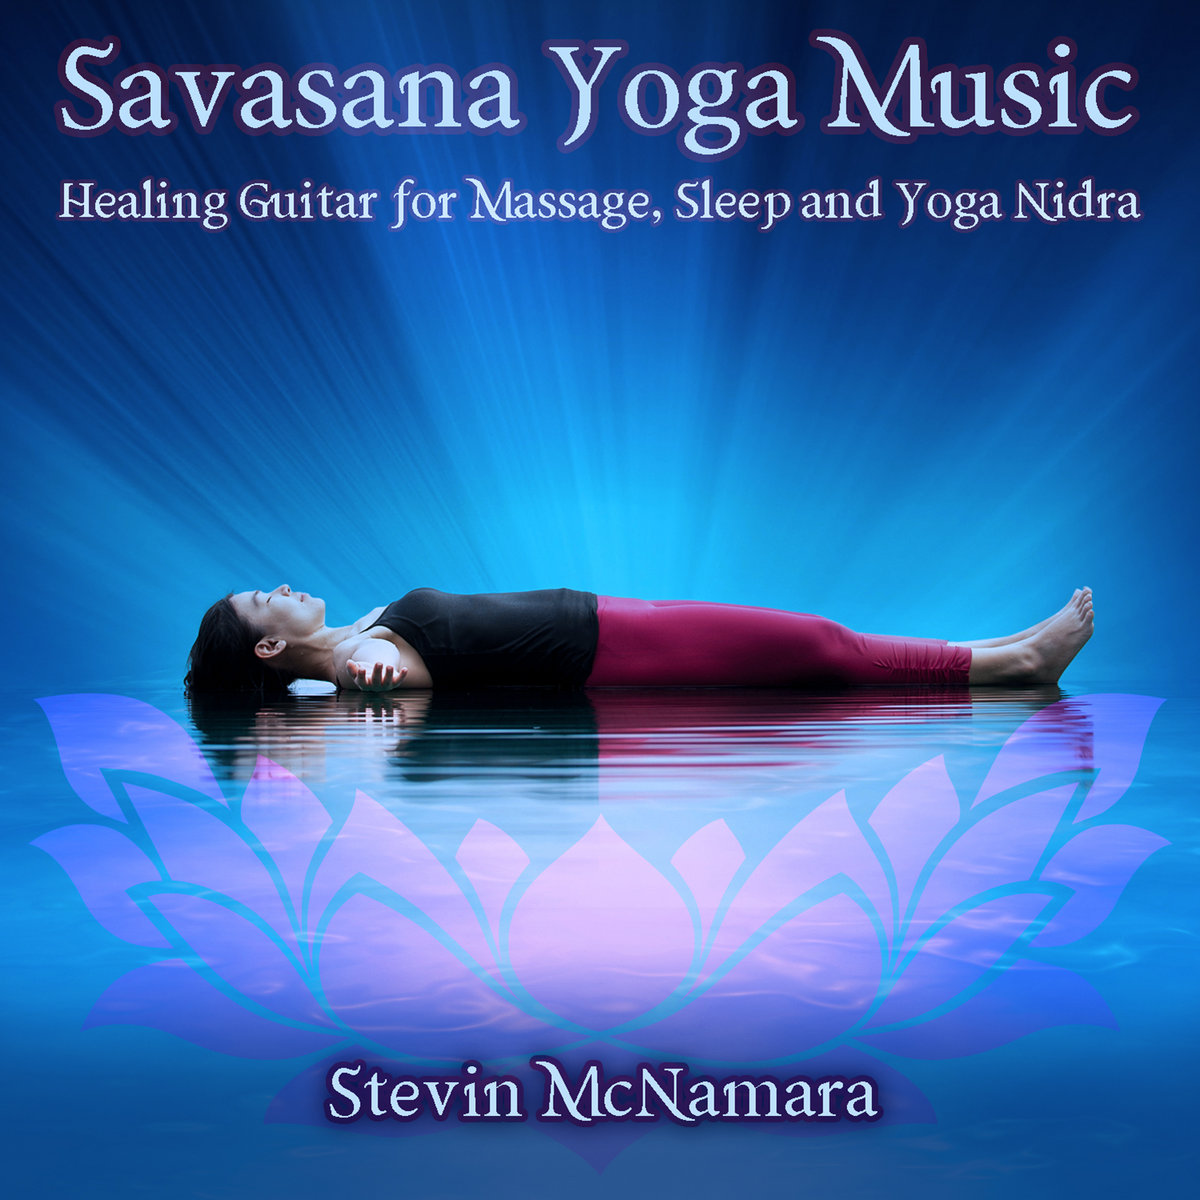 Savasana Yoga Music Healing Guitar For Massage Sleep And Nidra